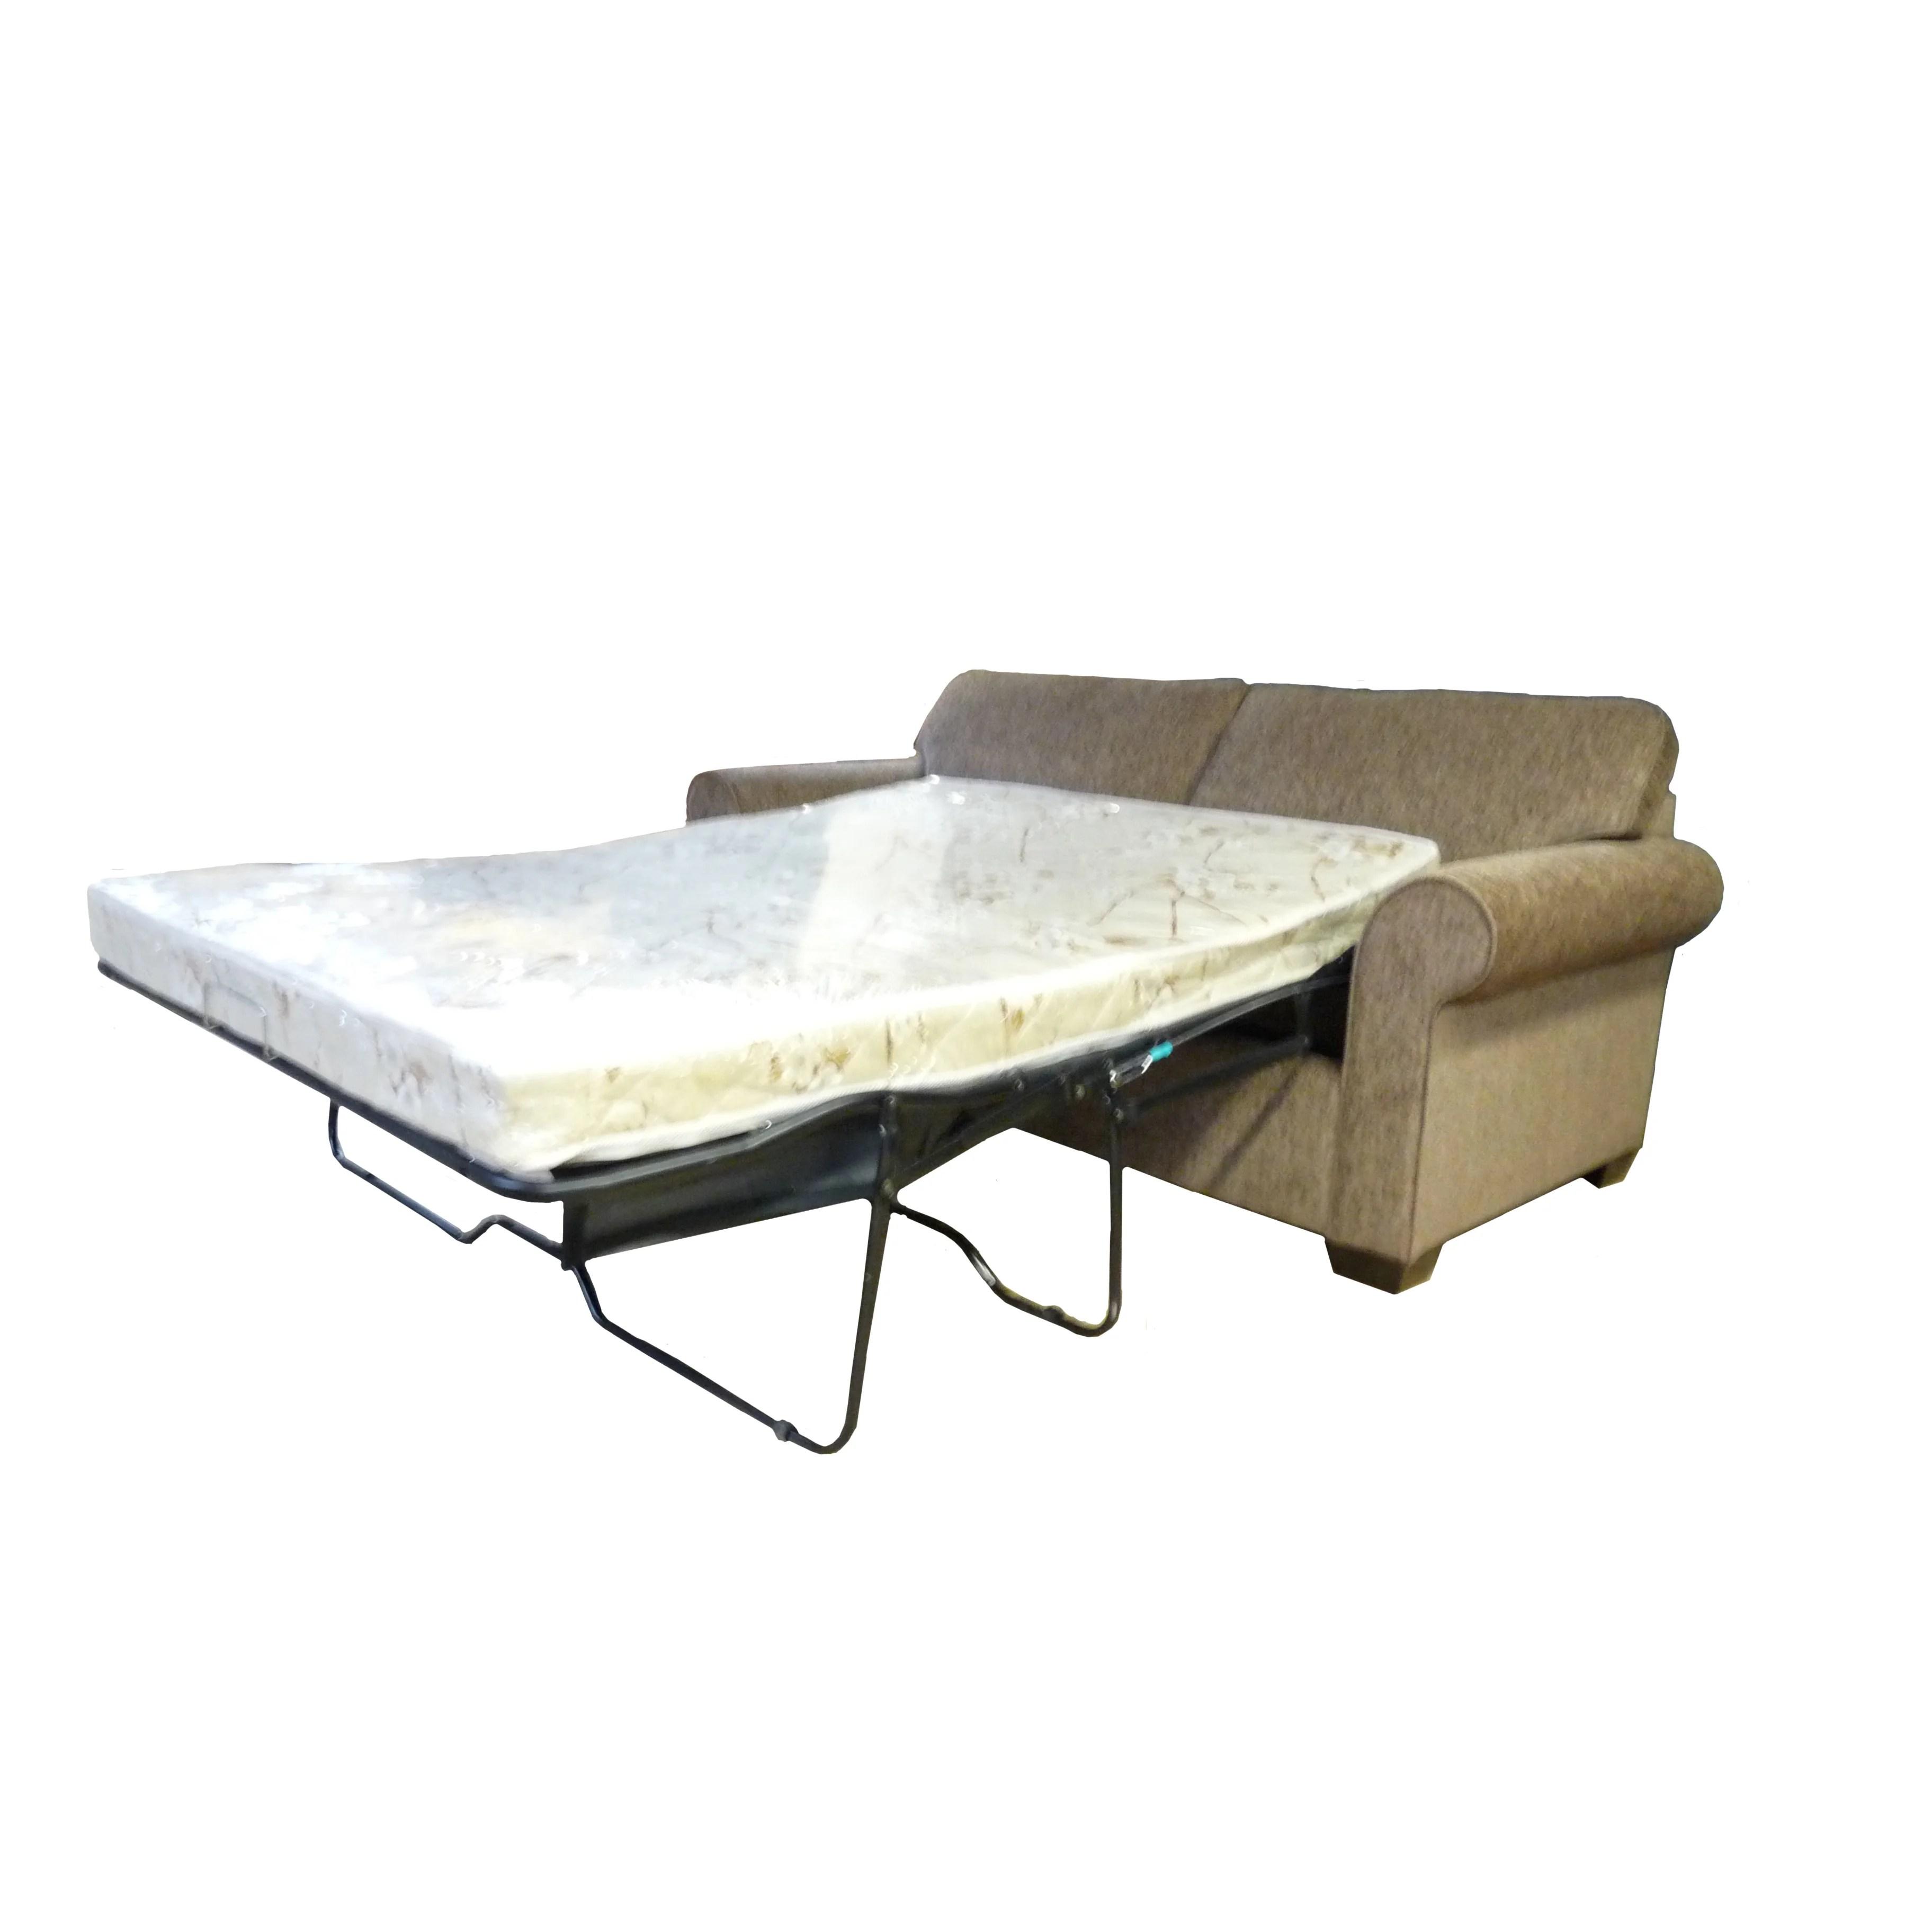 Sleeper Sofa One Pointedness Sleeper Sofa Beds On Sale Sleep Sofas Sleeper Sofa Beds On Sale